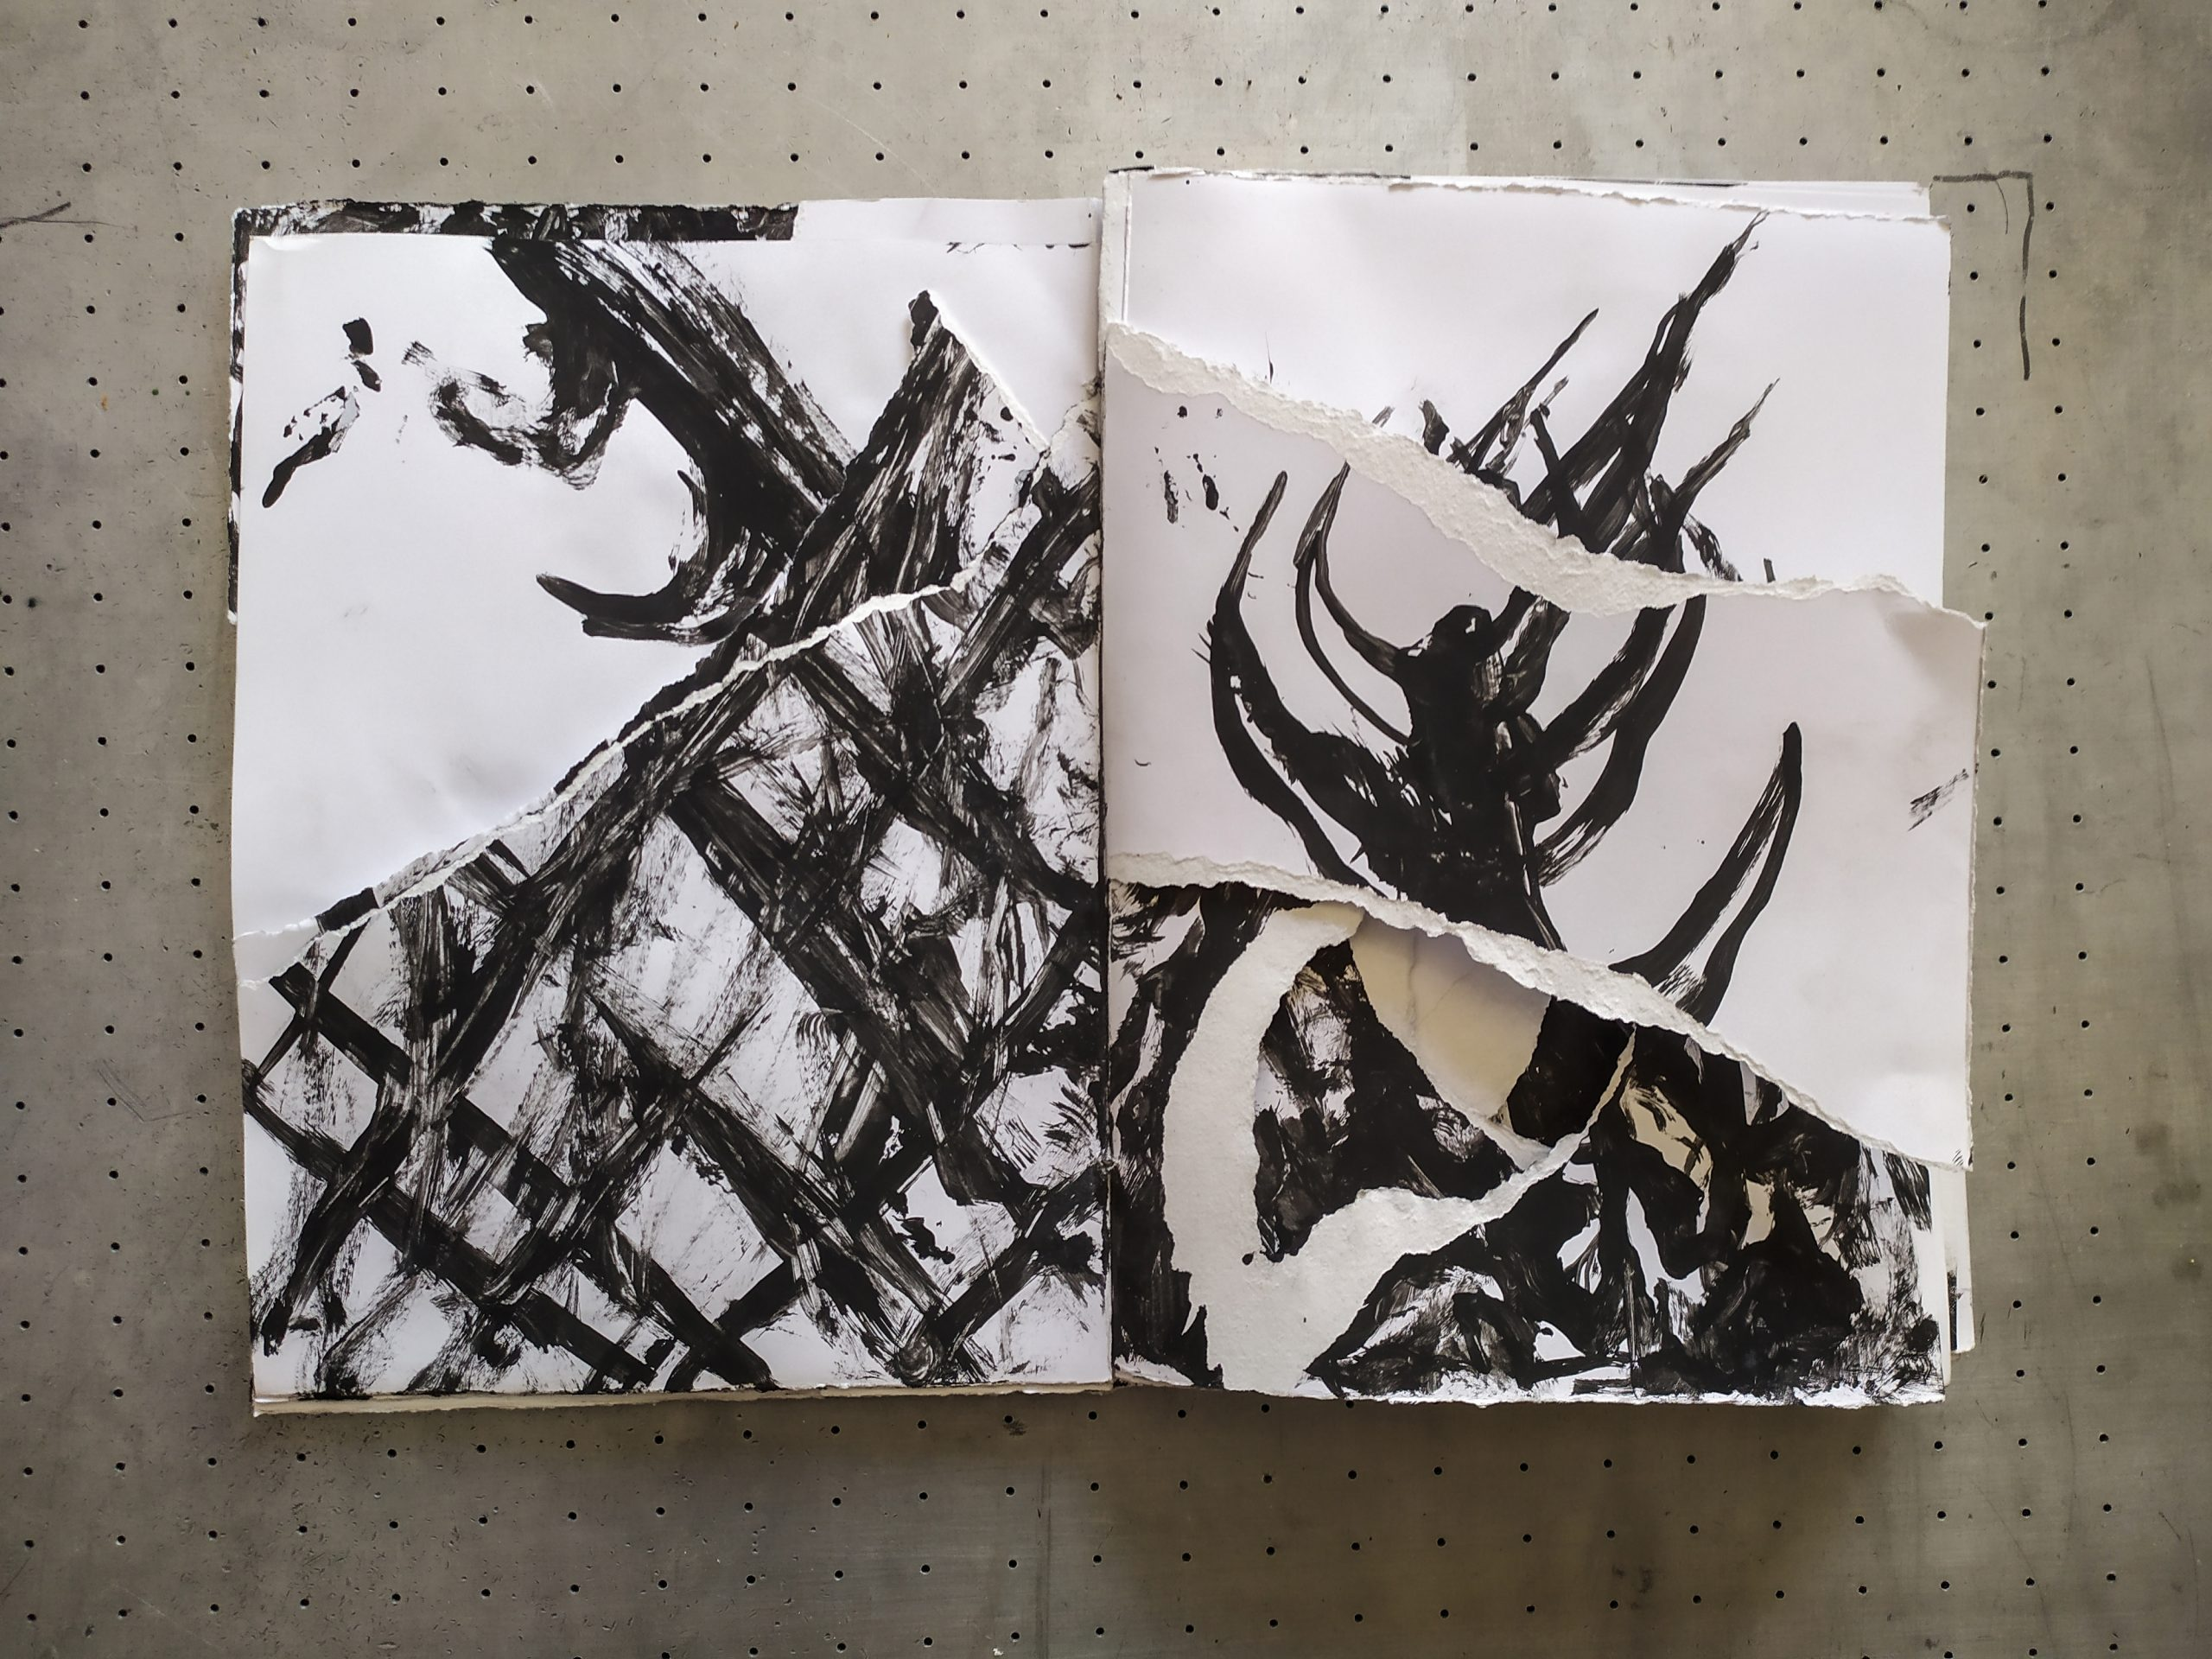 artistbook-sep-2021-carloszorromono-10